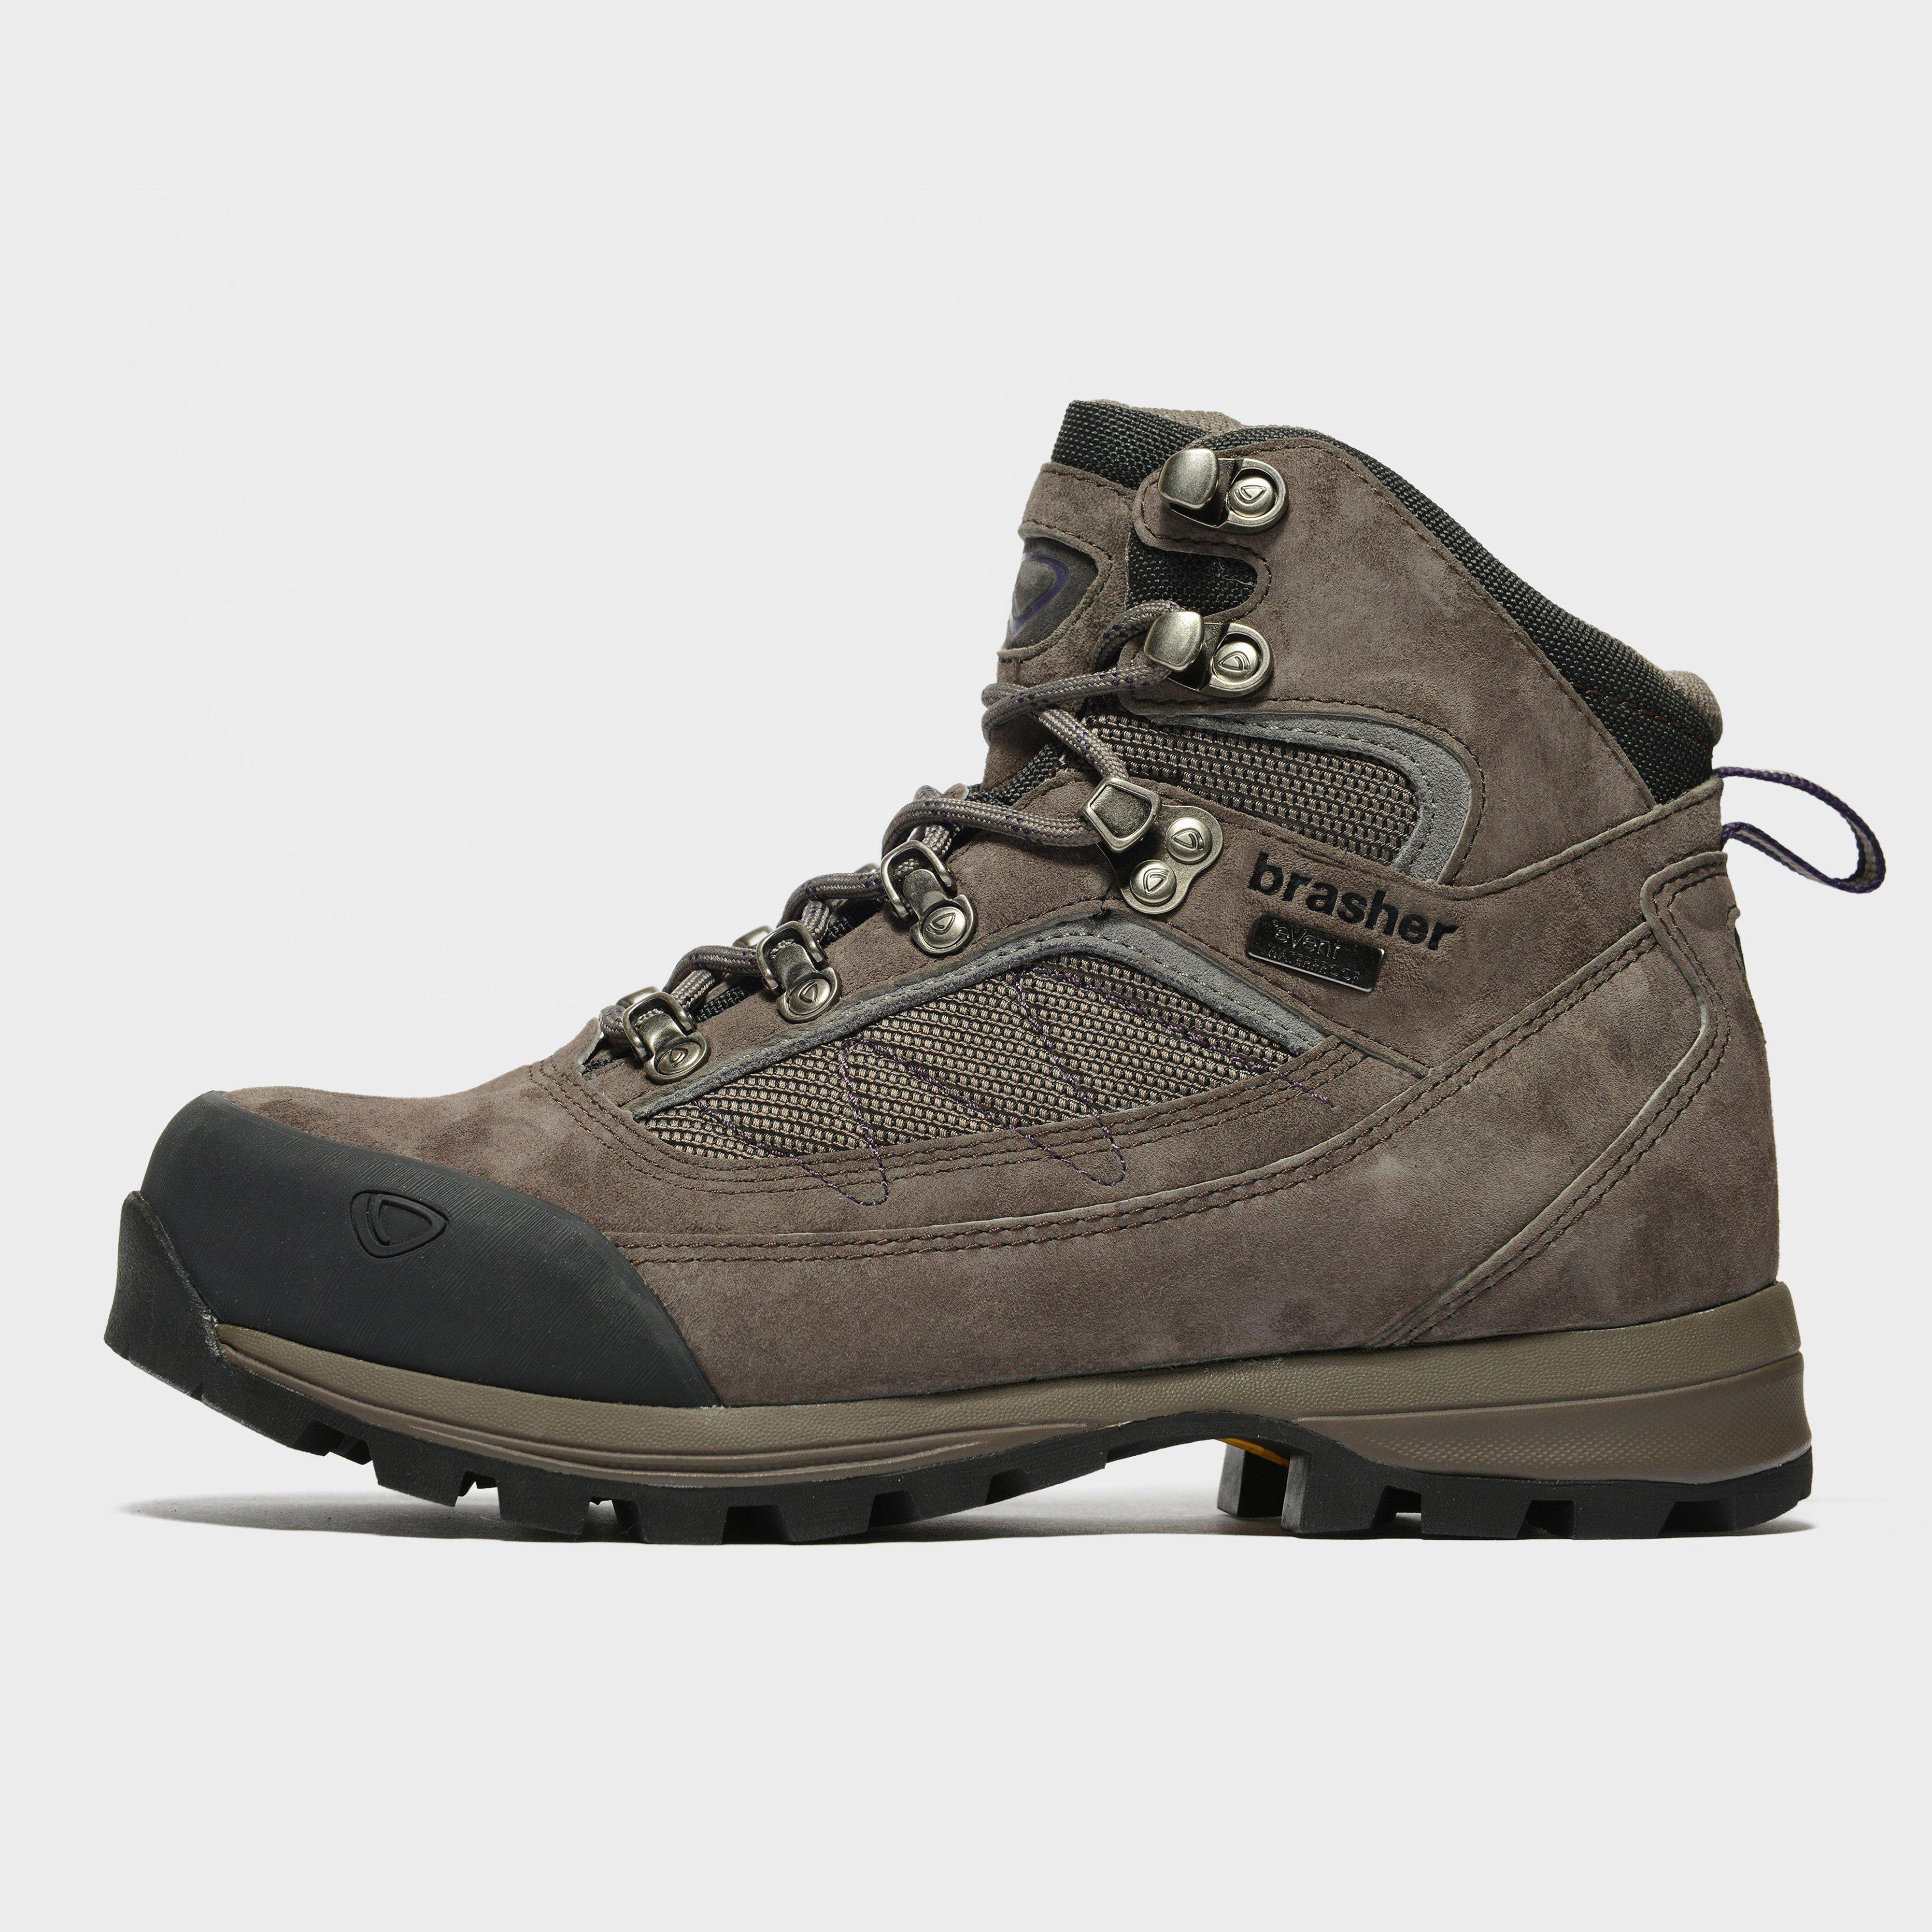 Brasher Womens Country Trekker Walking Boots - Grey/dgy  Grey/dgy